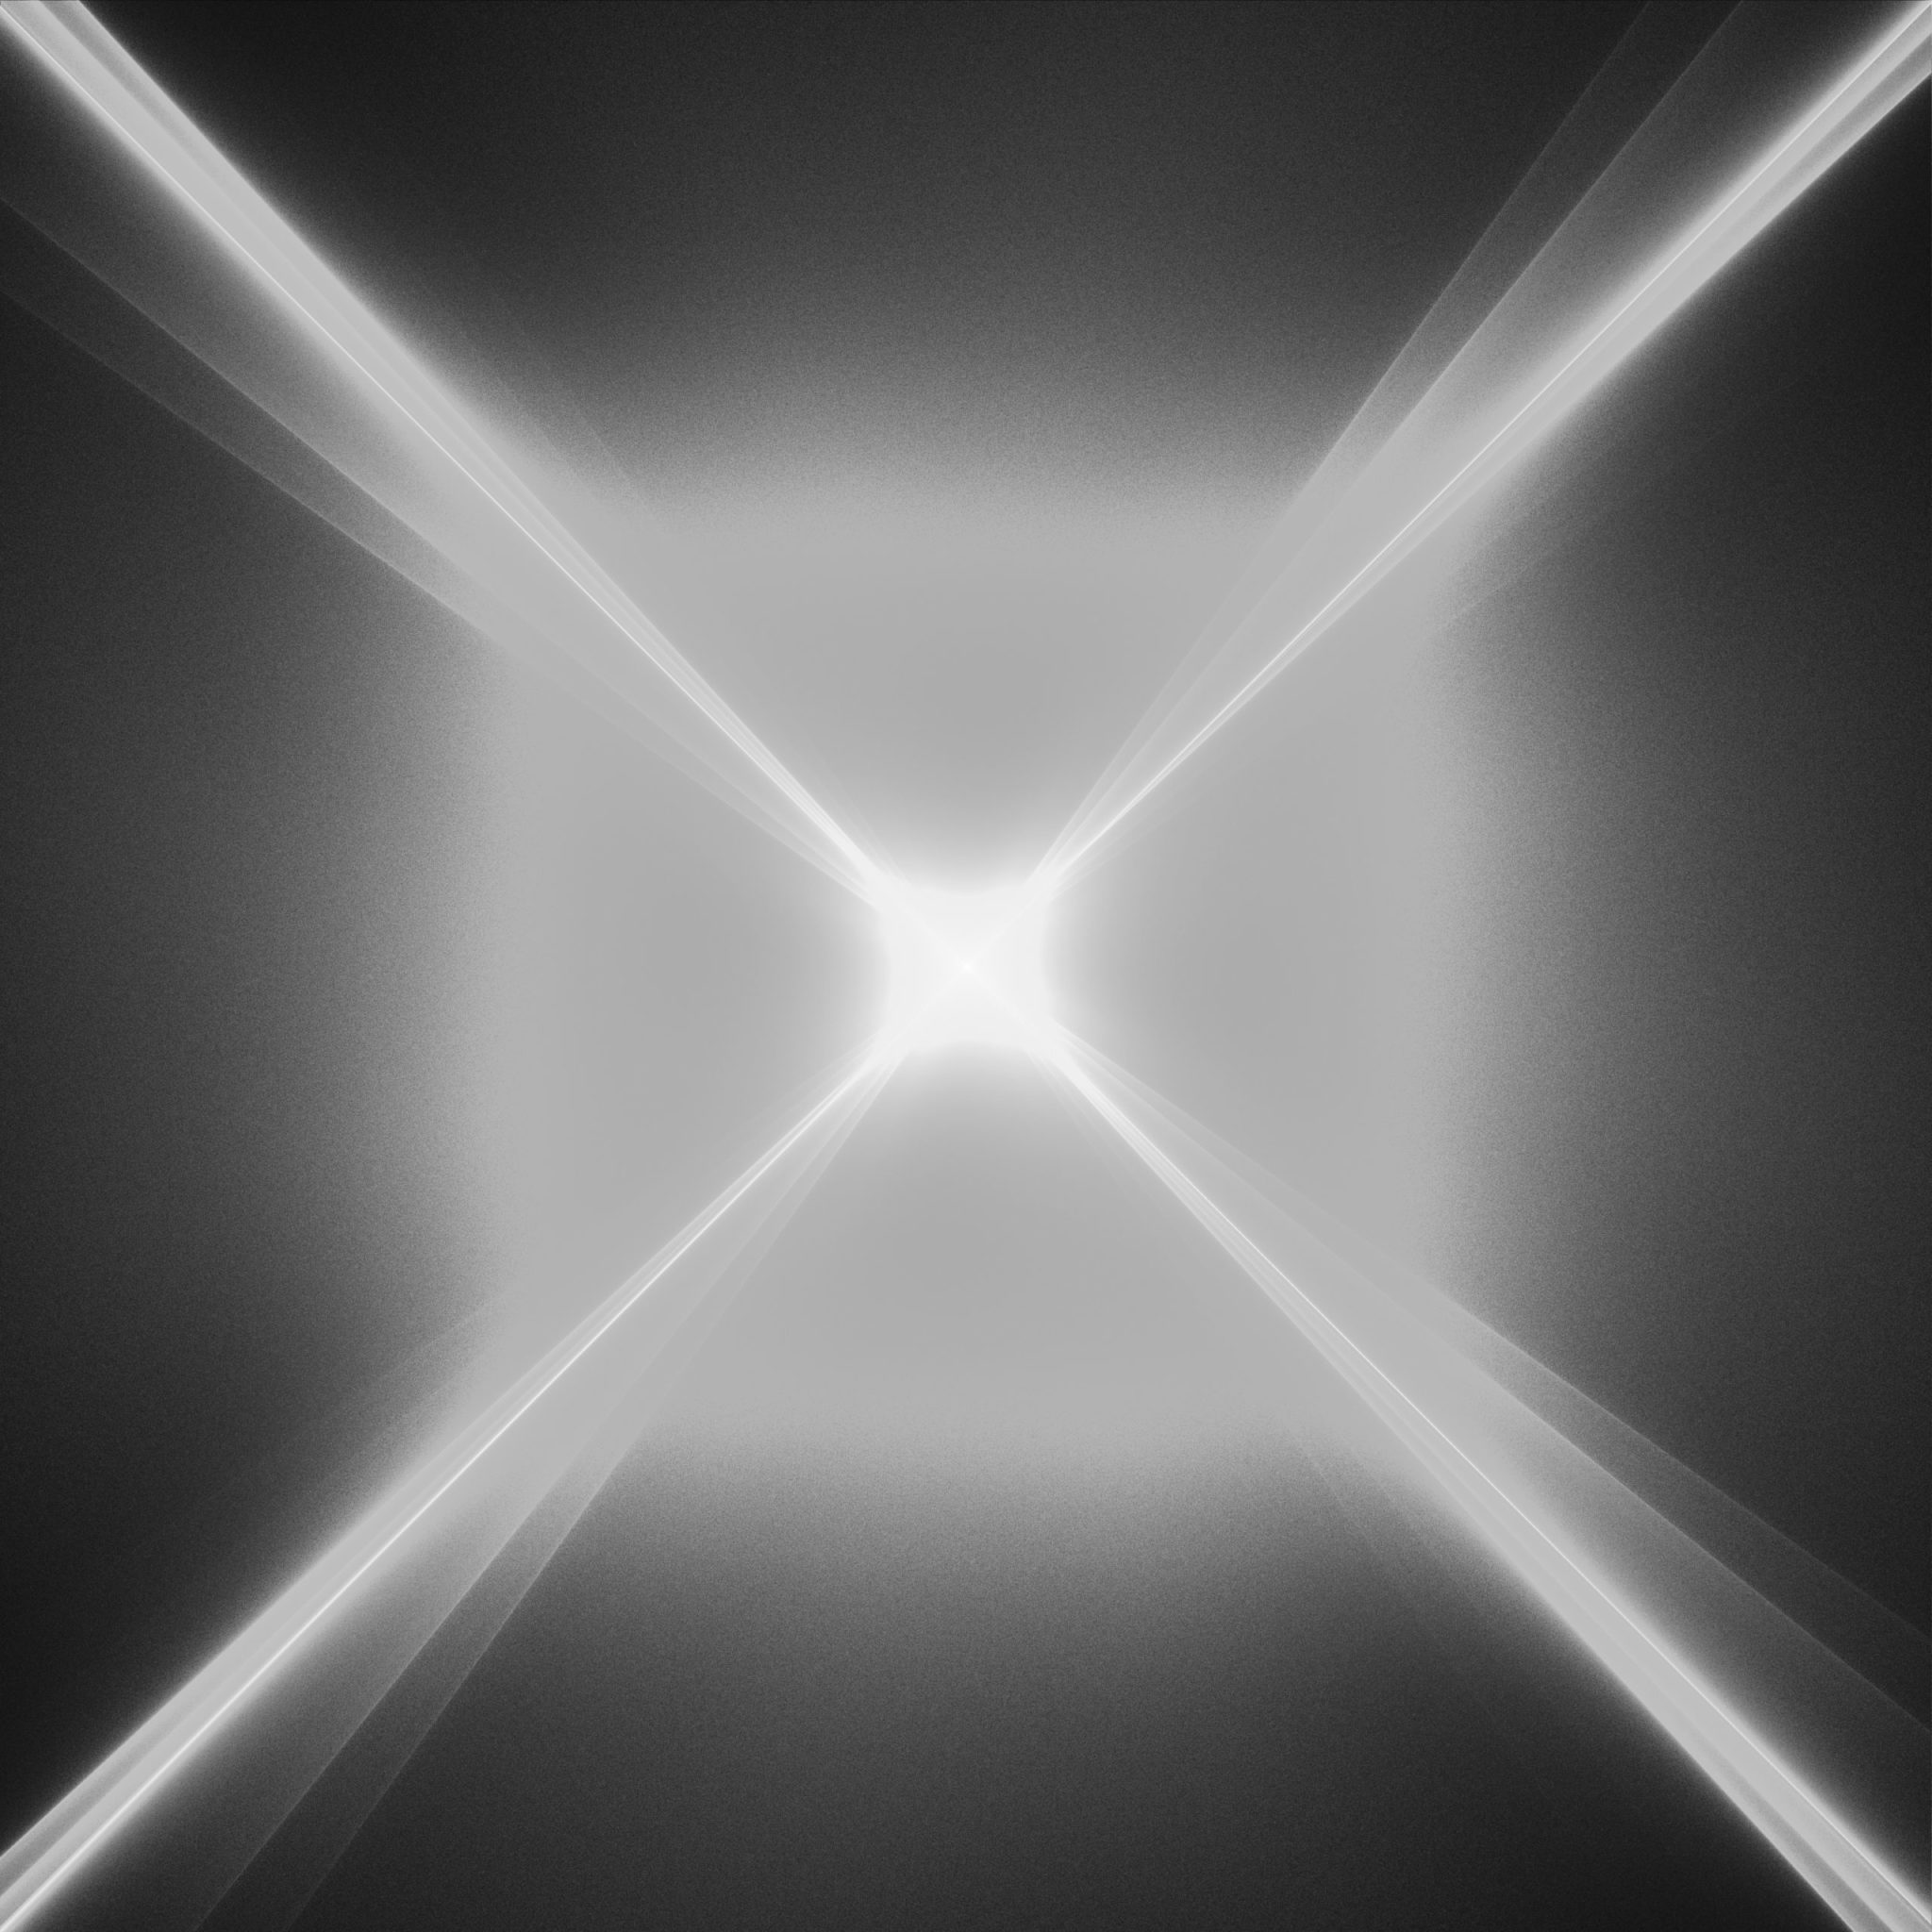 alexis-foucault_emergence-of-the-self_1536x1536@2x